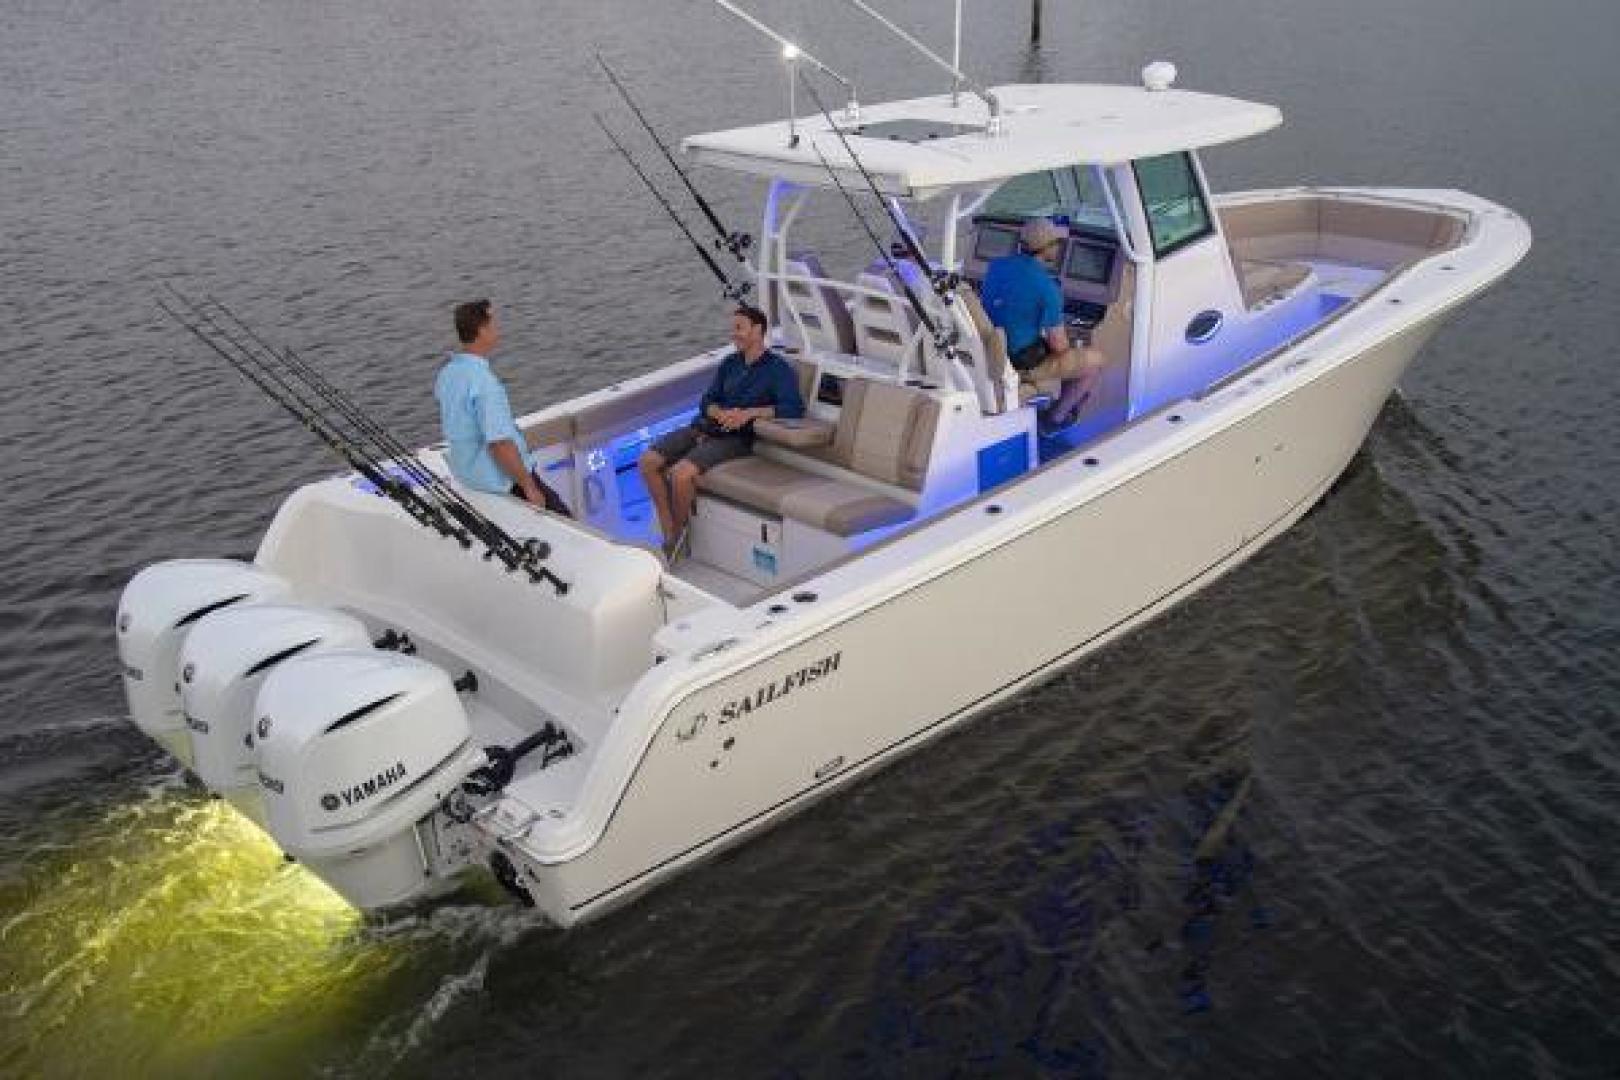 Sailfish-360 CC 2021-Sailfish 360 CC Fort Lauderdale-Florida-United States-Manufacturer Provided Image-1524499 | Thumbnail